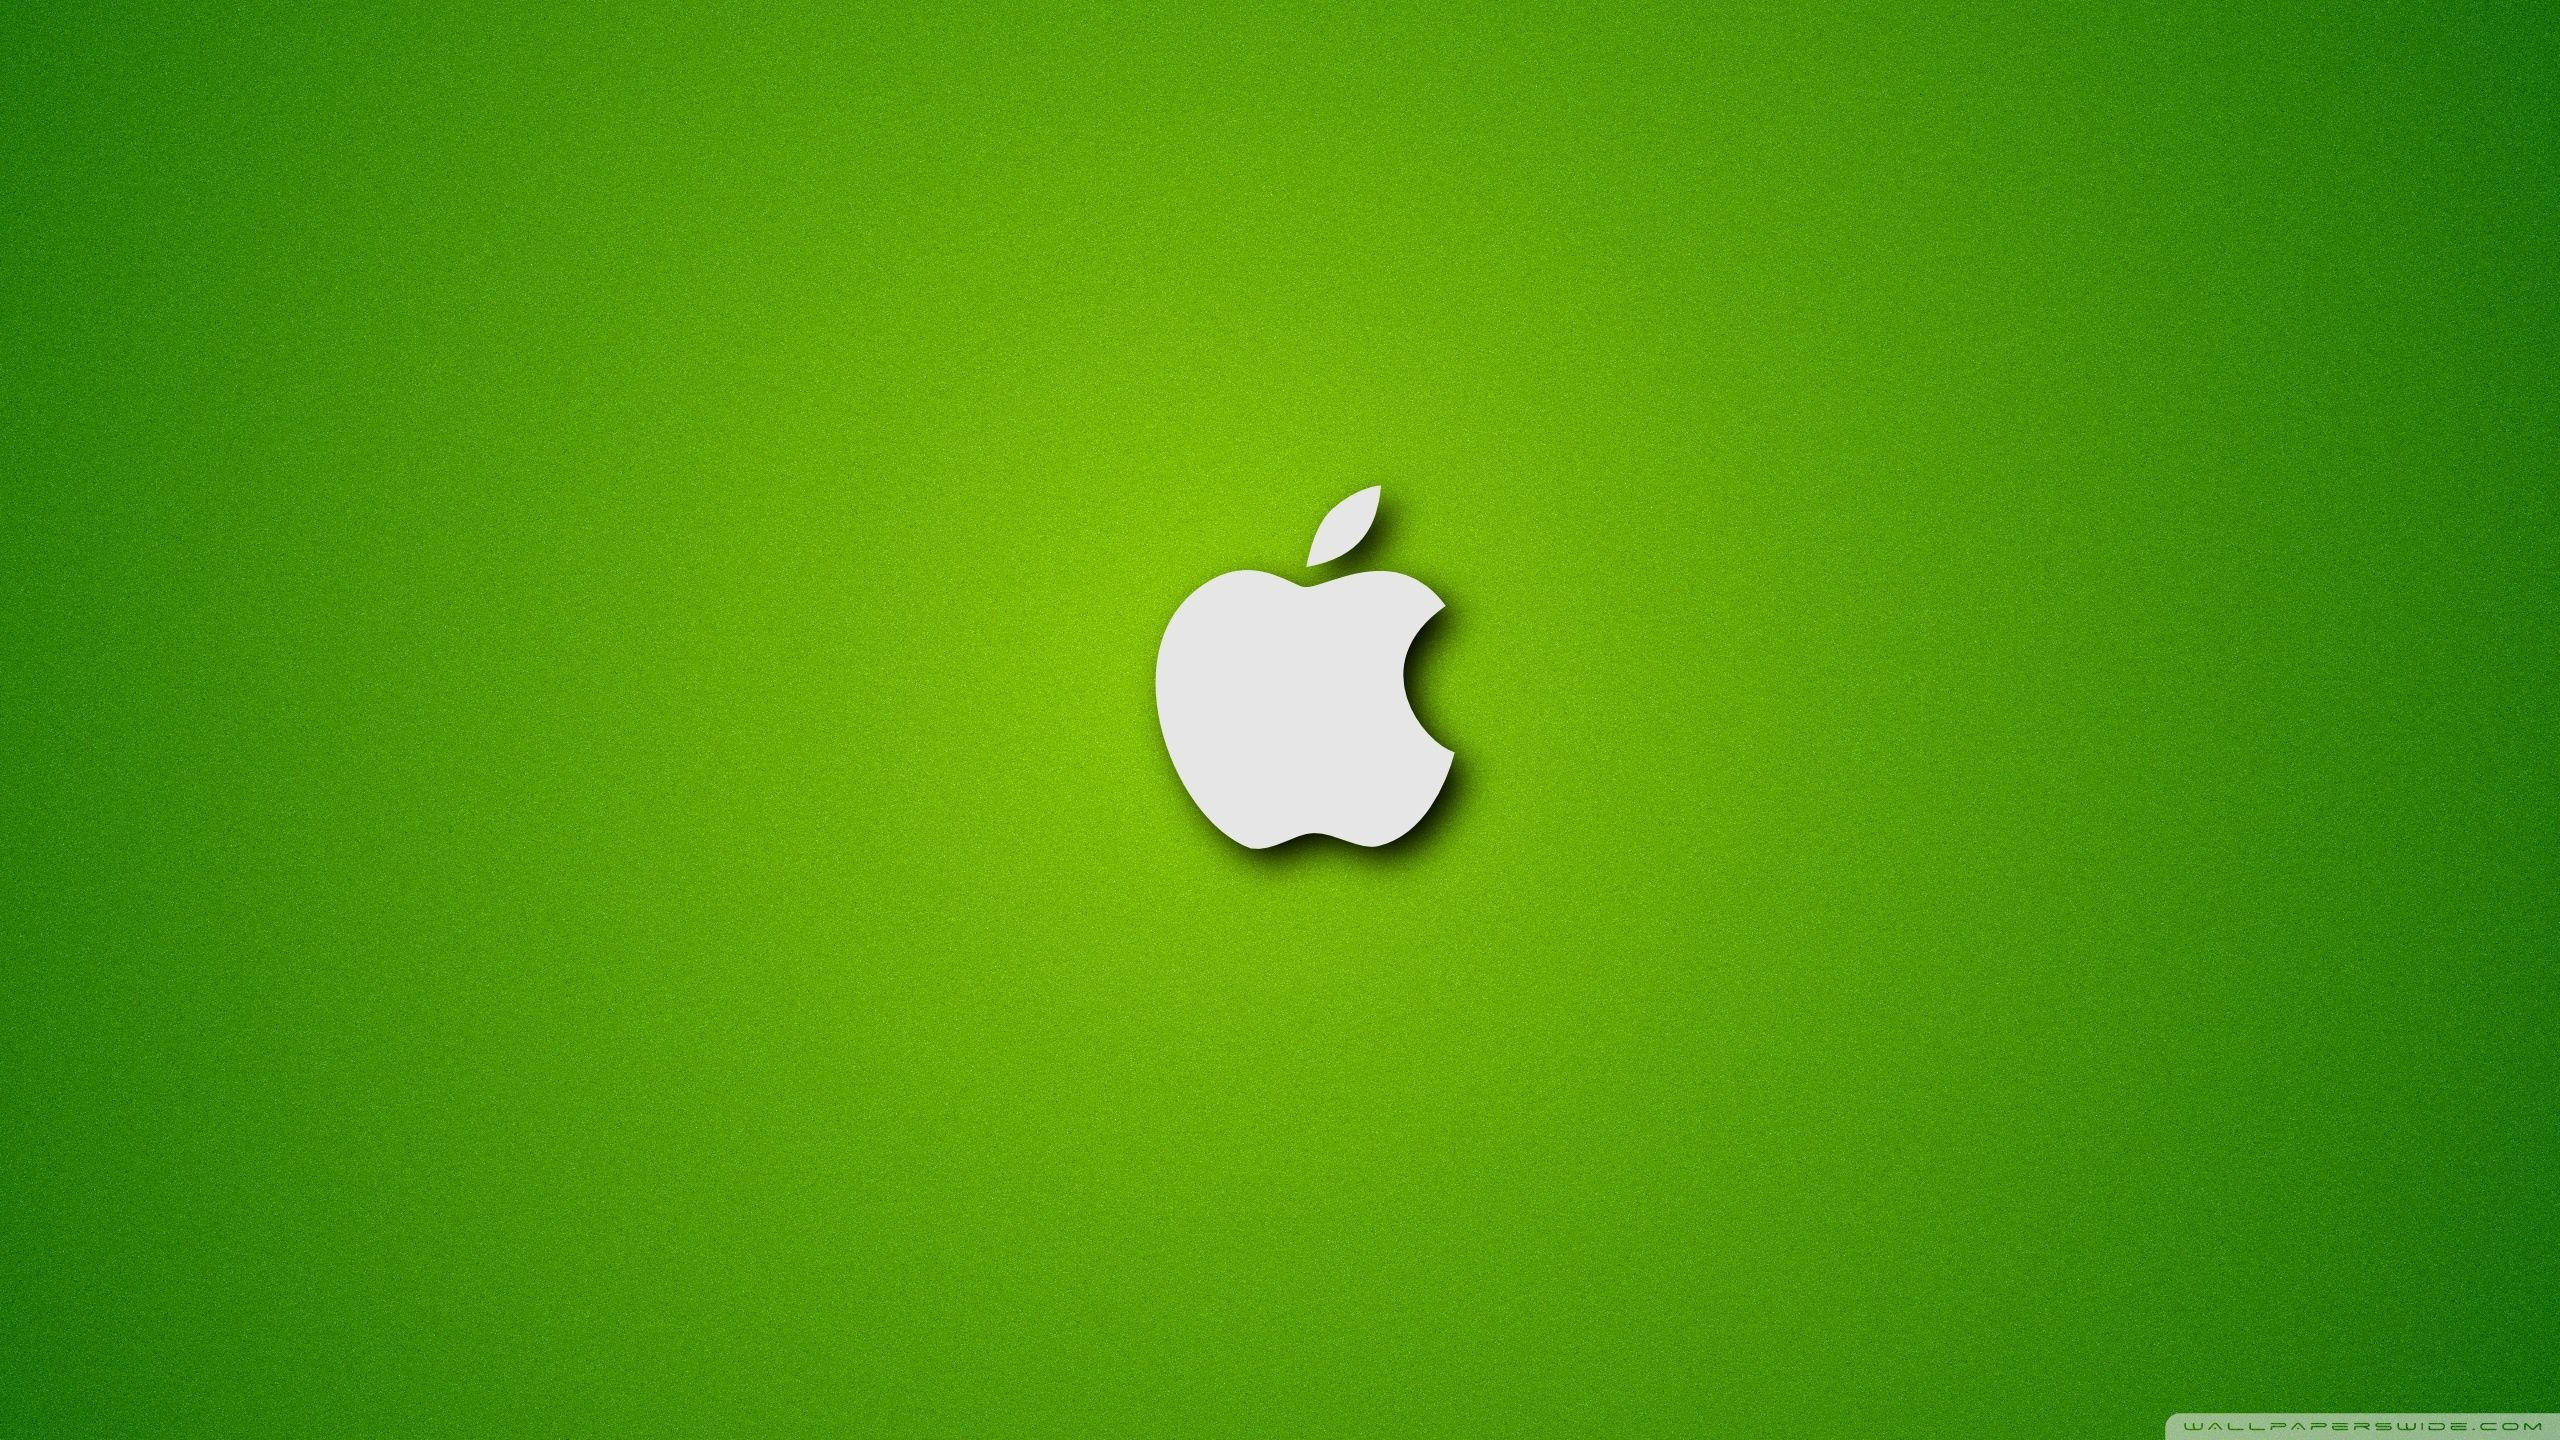 Green Apple Logo Wallpapers Top Free Green Apple Logo Backgrounds Wallpaperaccess